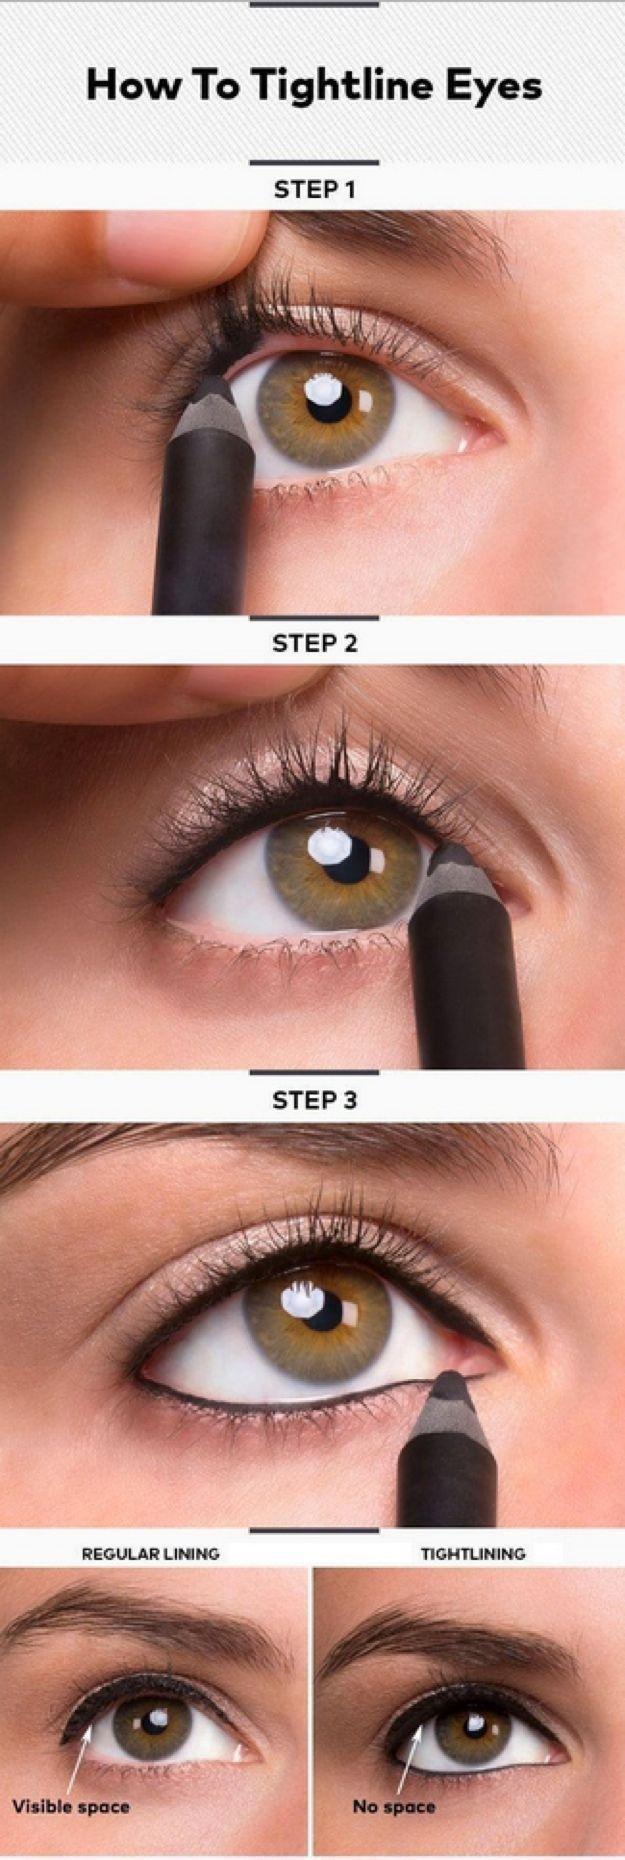 Eyeliner Tips and Tricks for A Perfect Tightline Eyeliner.